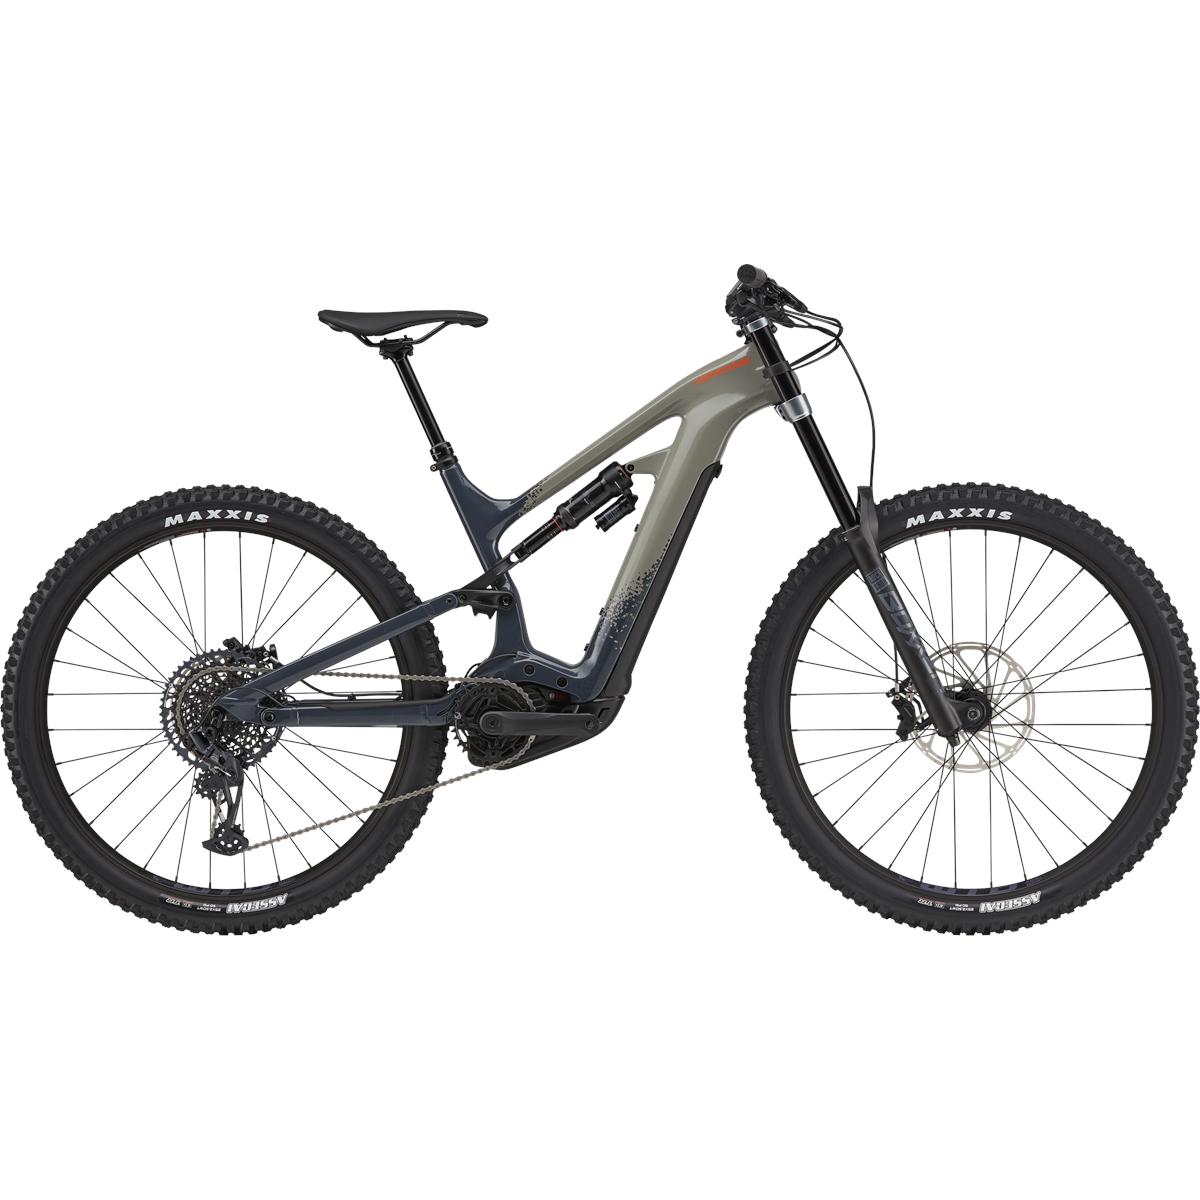 "Cannondale MOTERRA NEO Carbon SE - 29"" MTB E-Bike - 2021 - Stealth Gray"